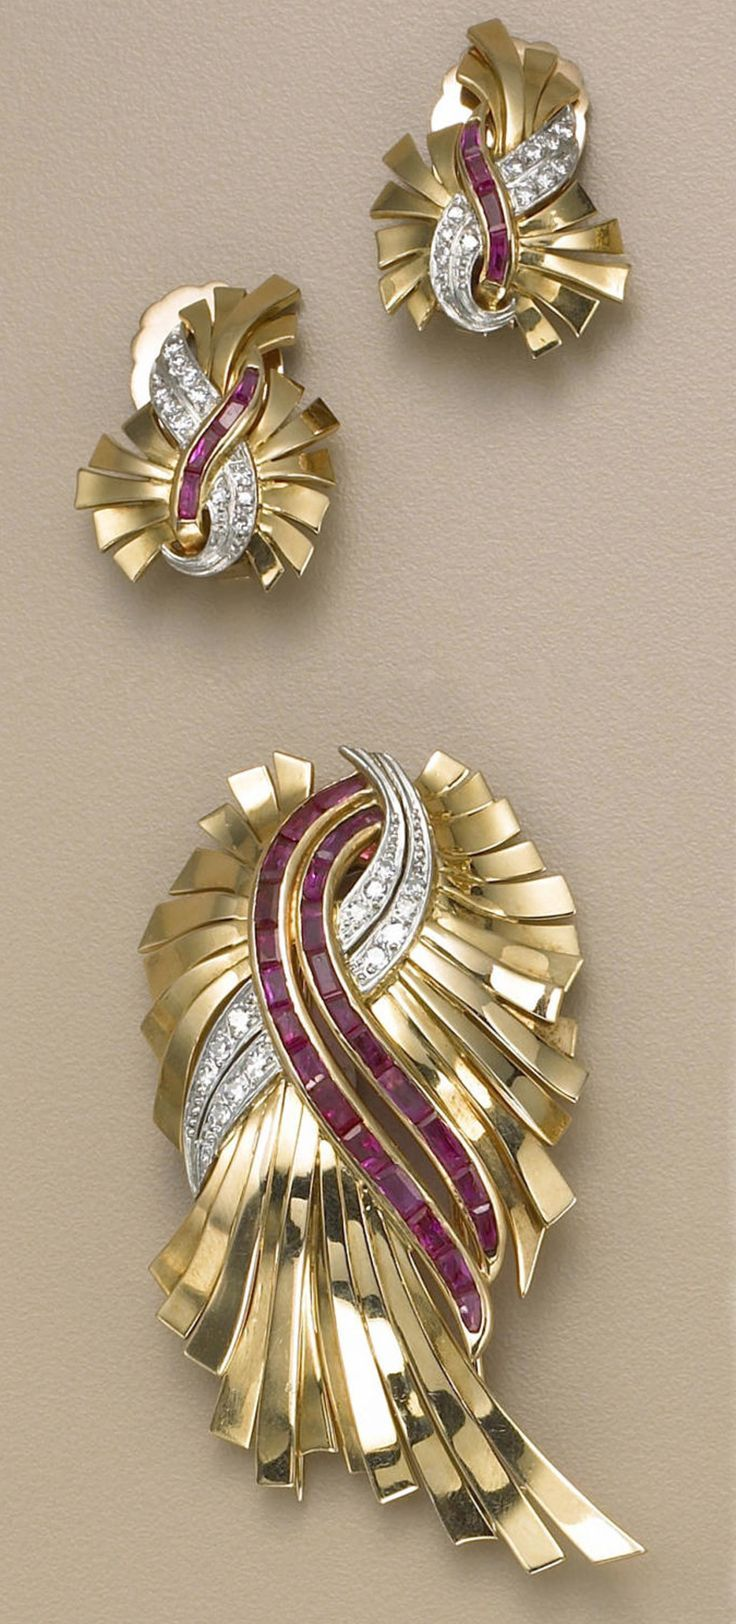 best art nouveau jewelry images on pinterest ancient jewelry